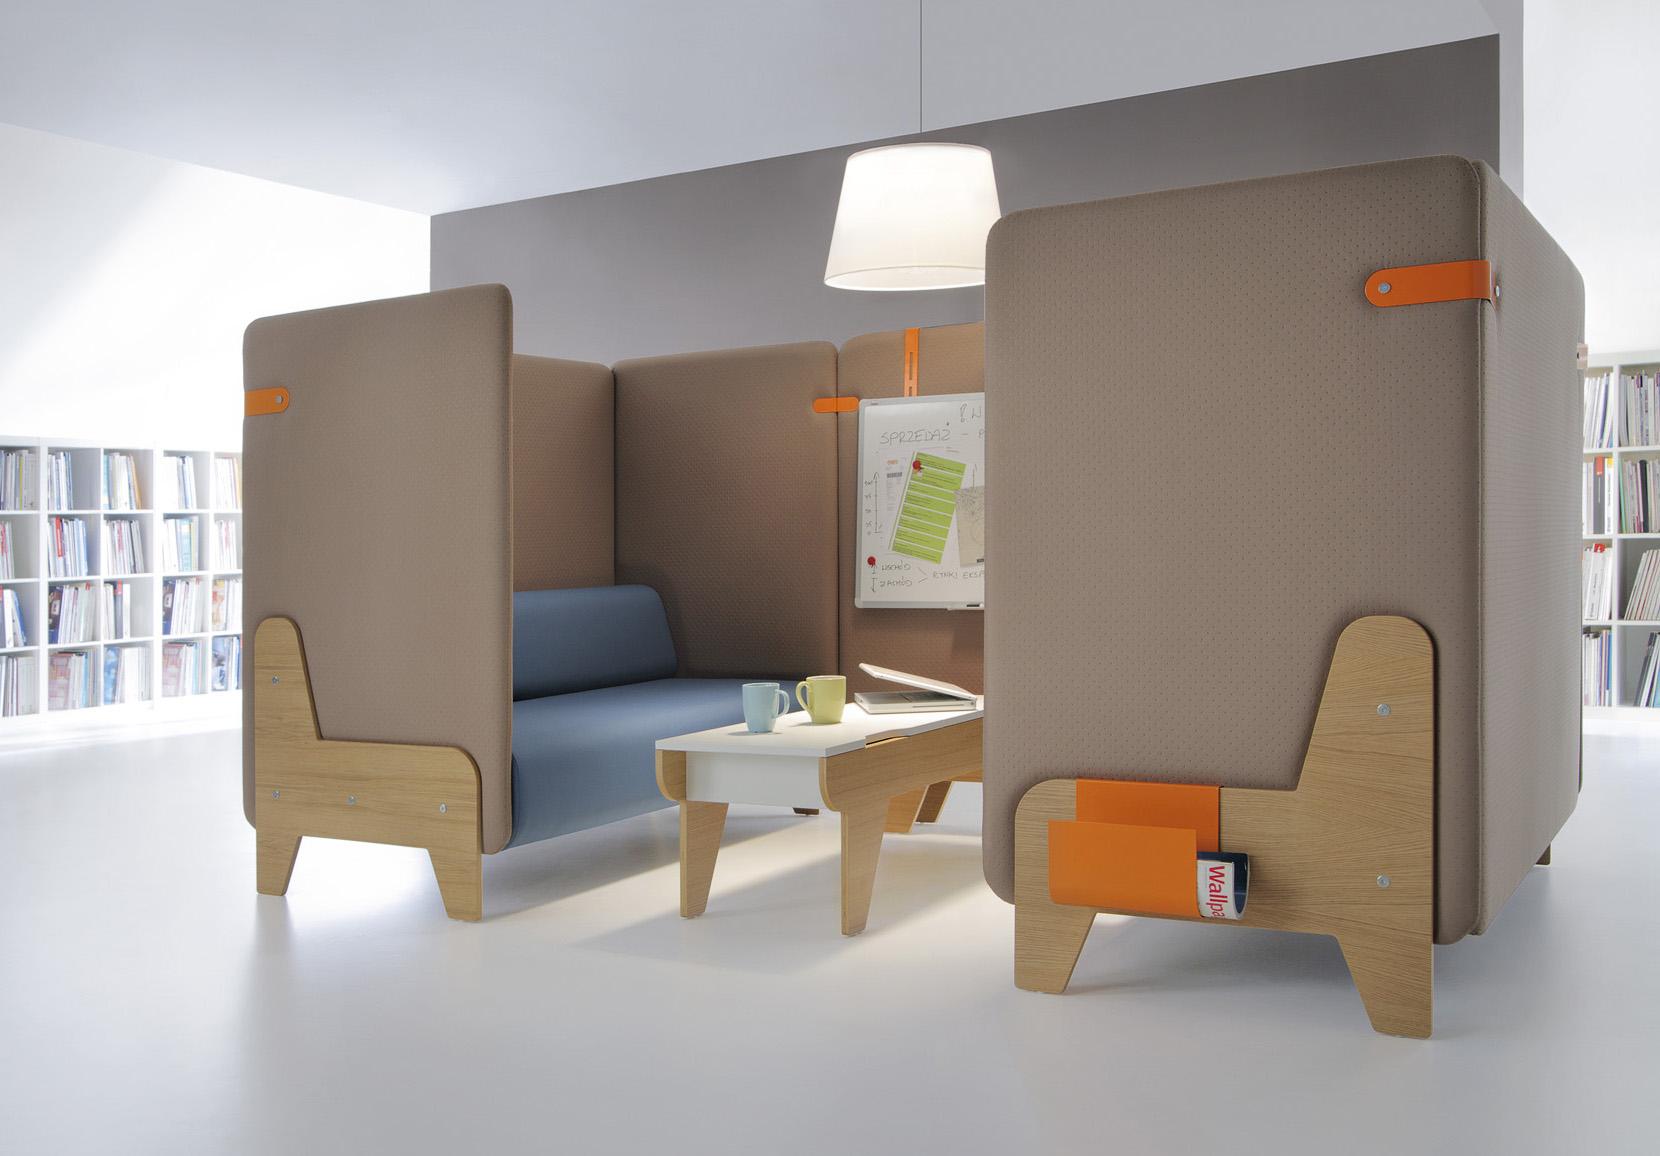 Chillout akoestische bank akoestisch meubilair - Chill out sofas ...